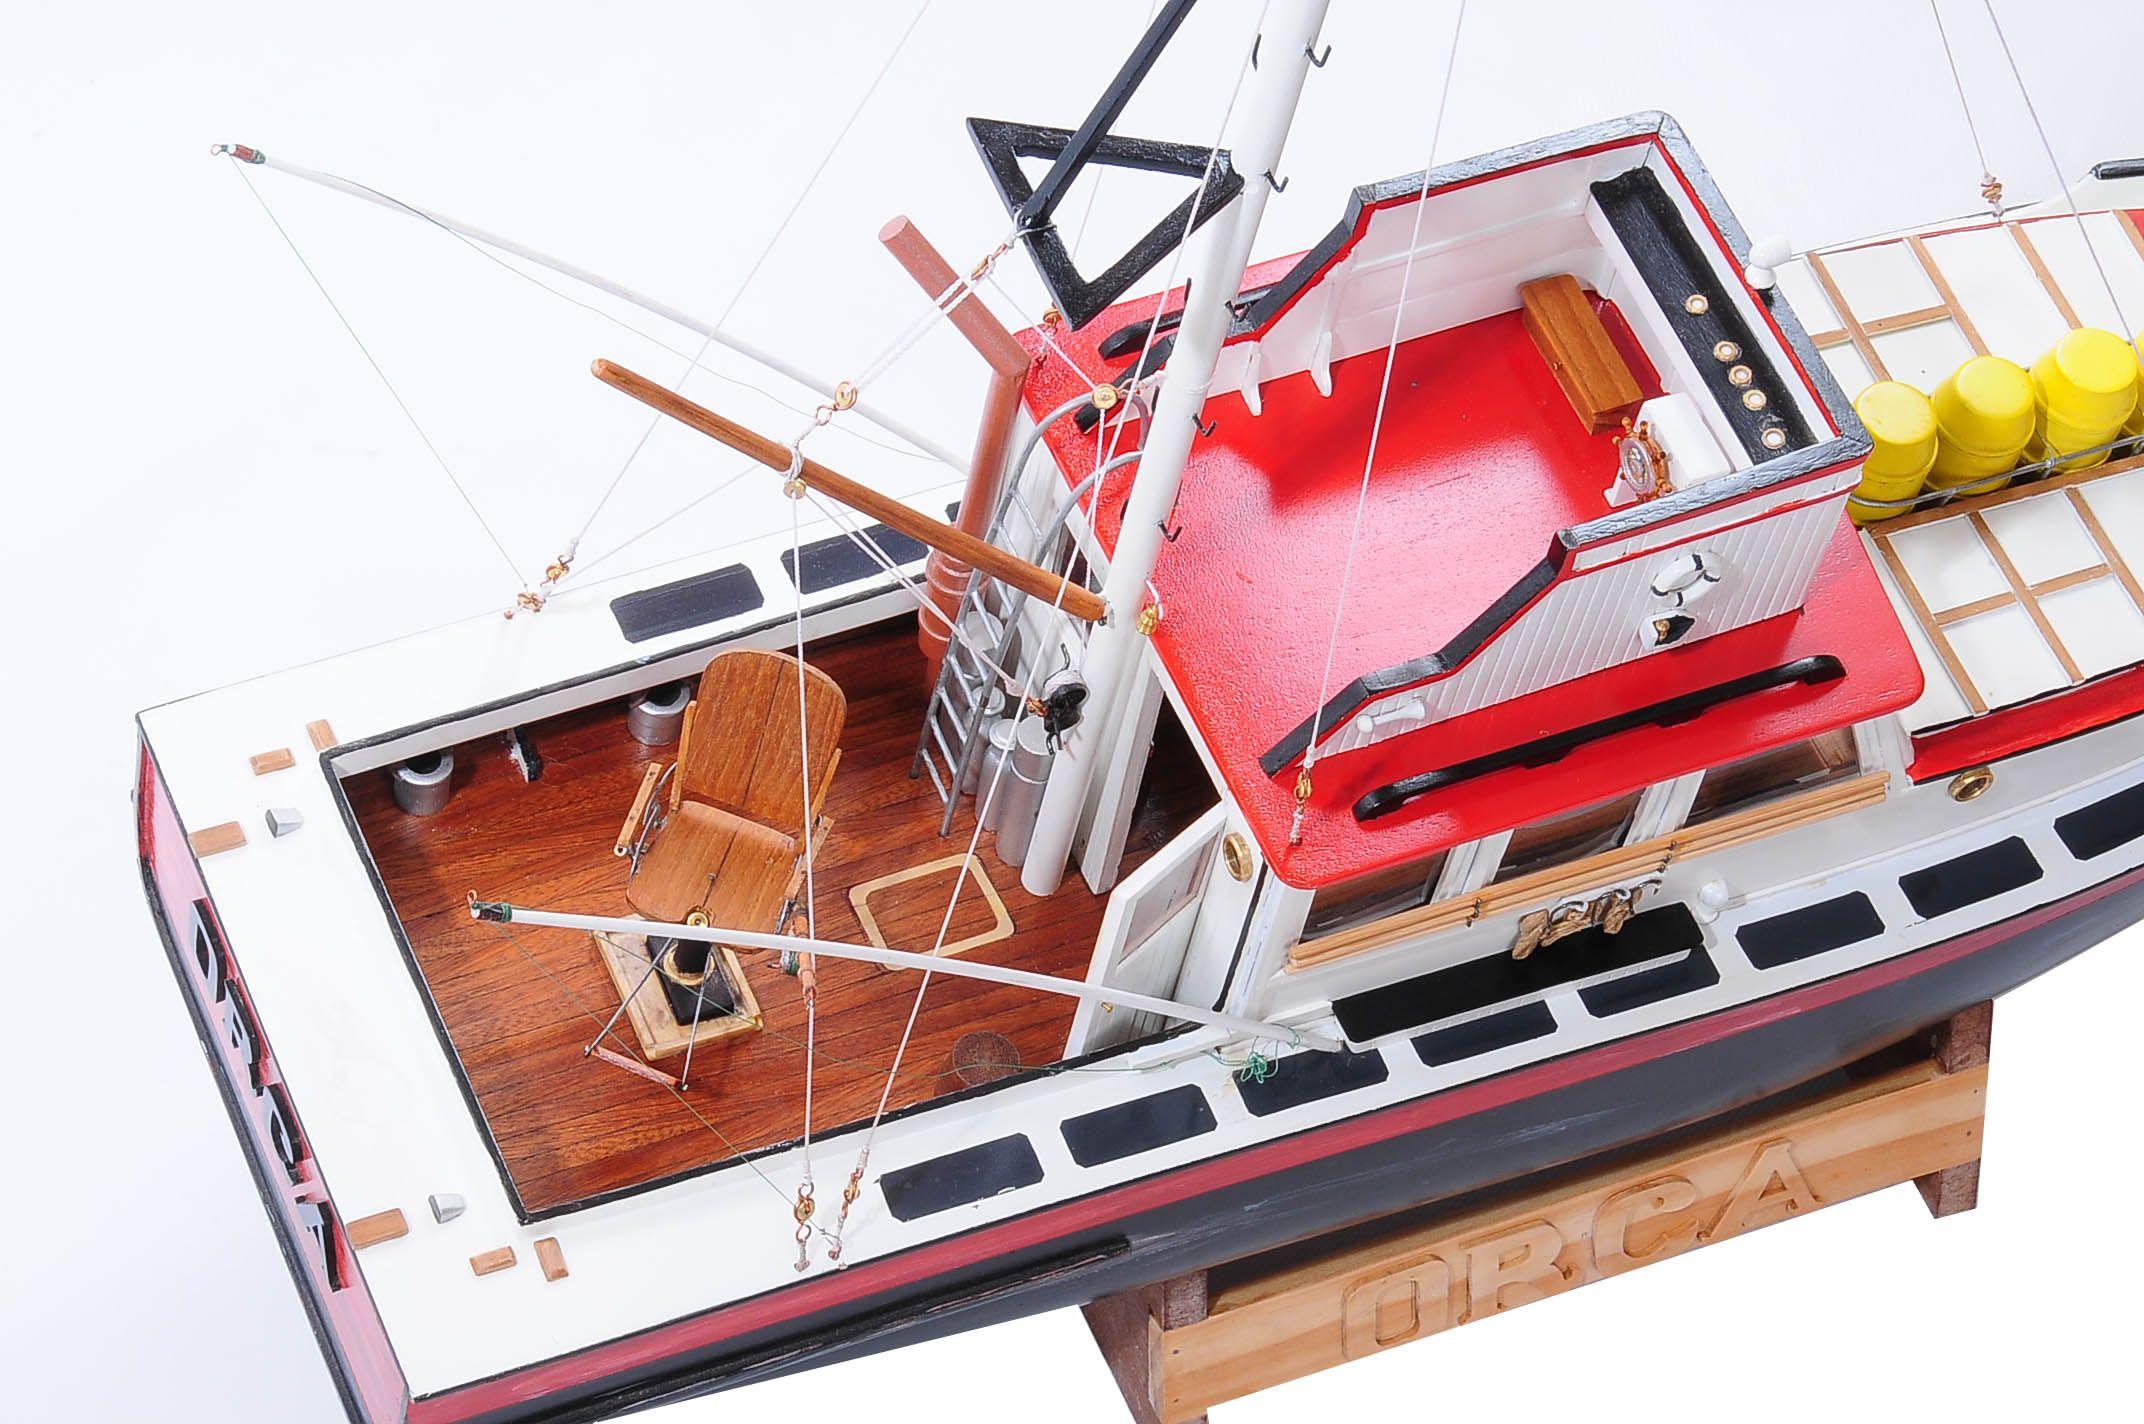 Orca Model Boats